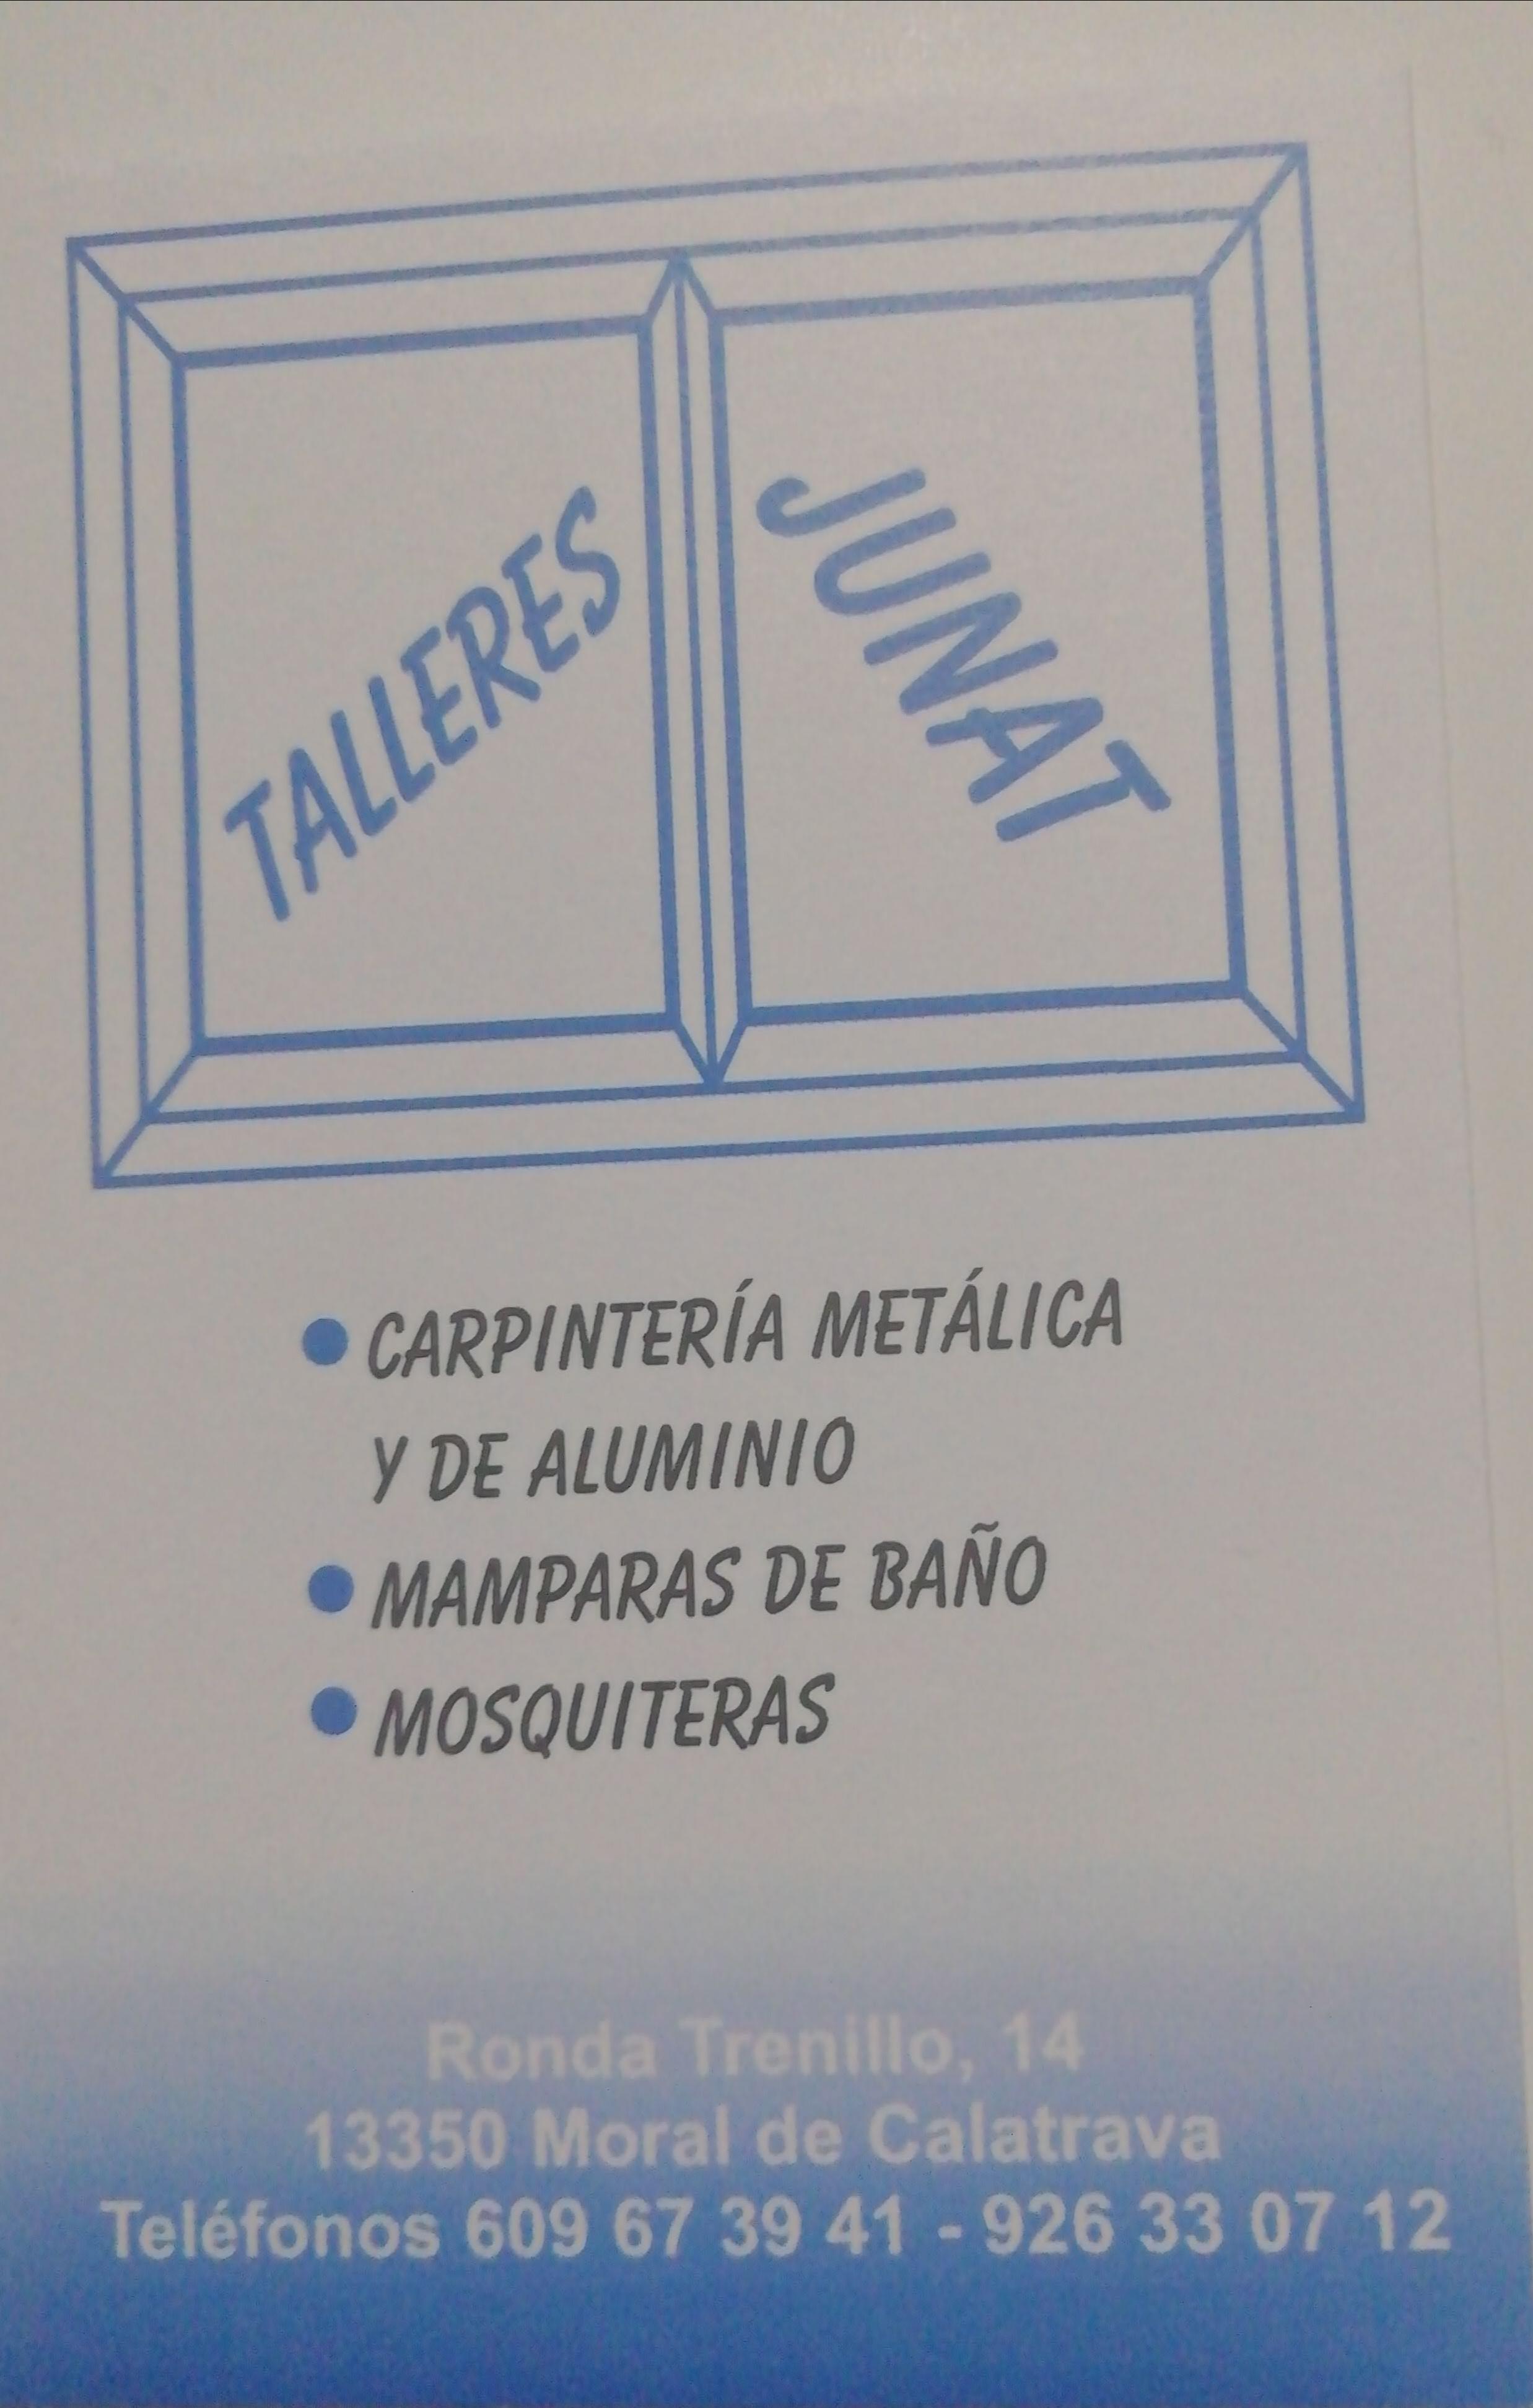 Aluminios Juan Ramón Huertas Salvador